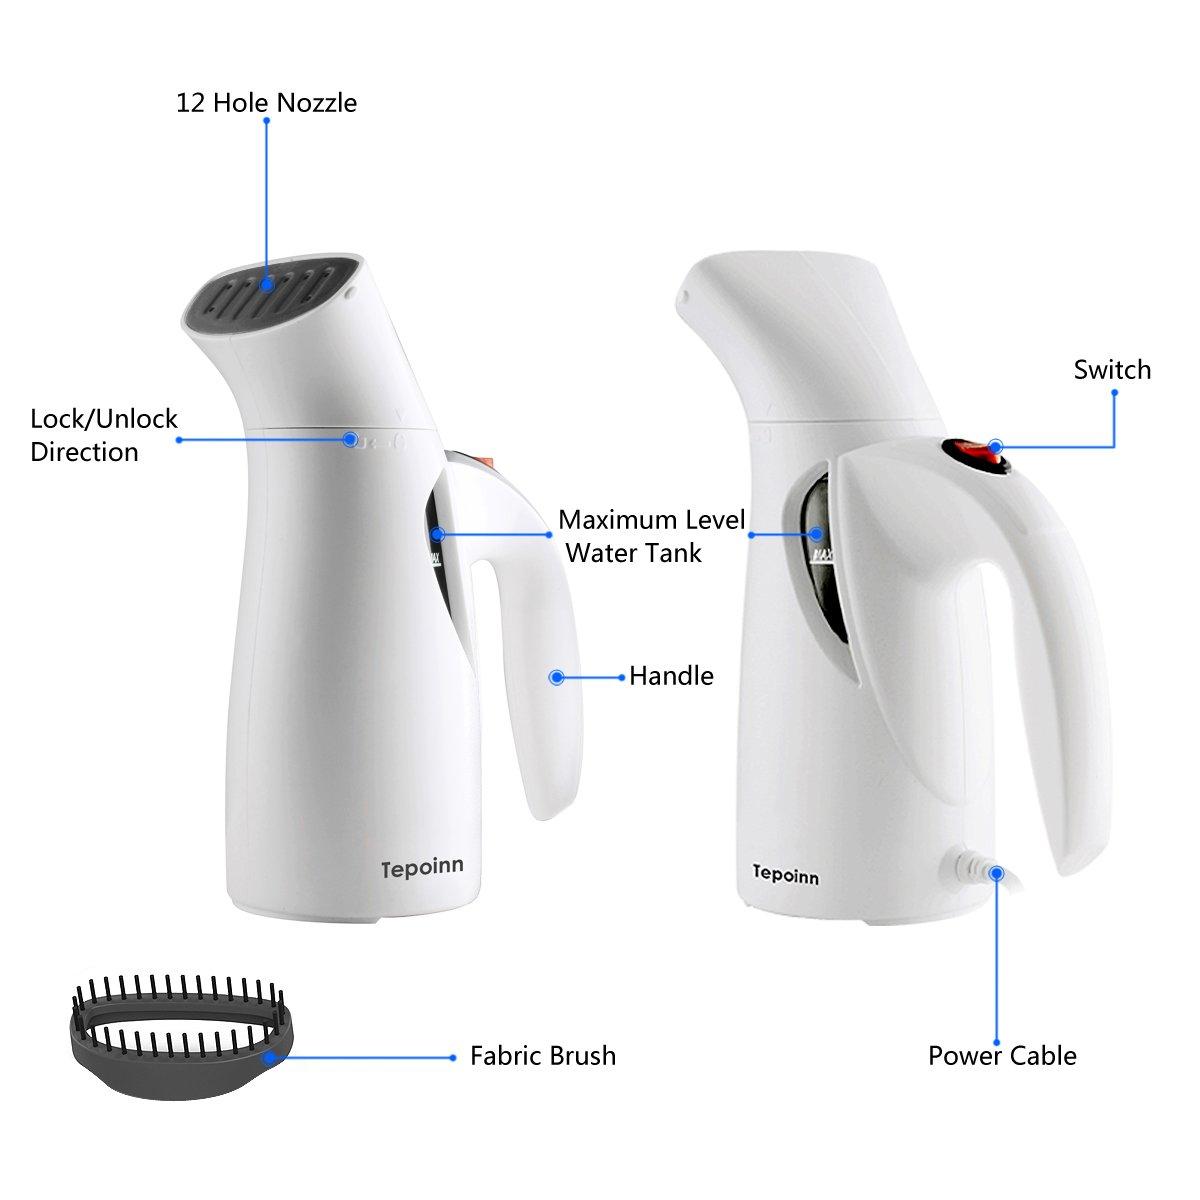 Tepoinn Clothes Steamer for Travel Garment Steamer Portable Fabric Steamer (one gear)